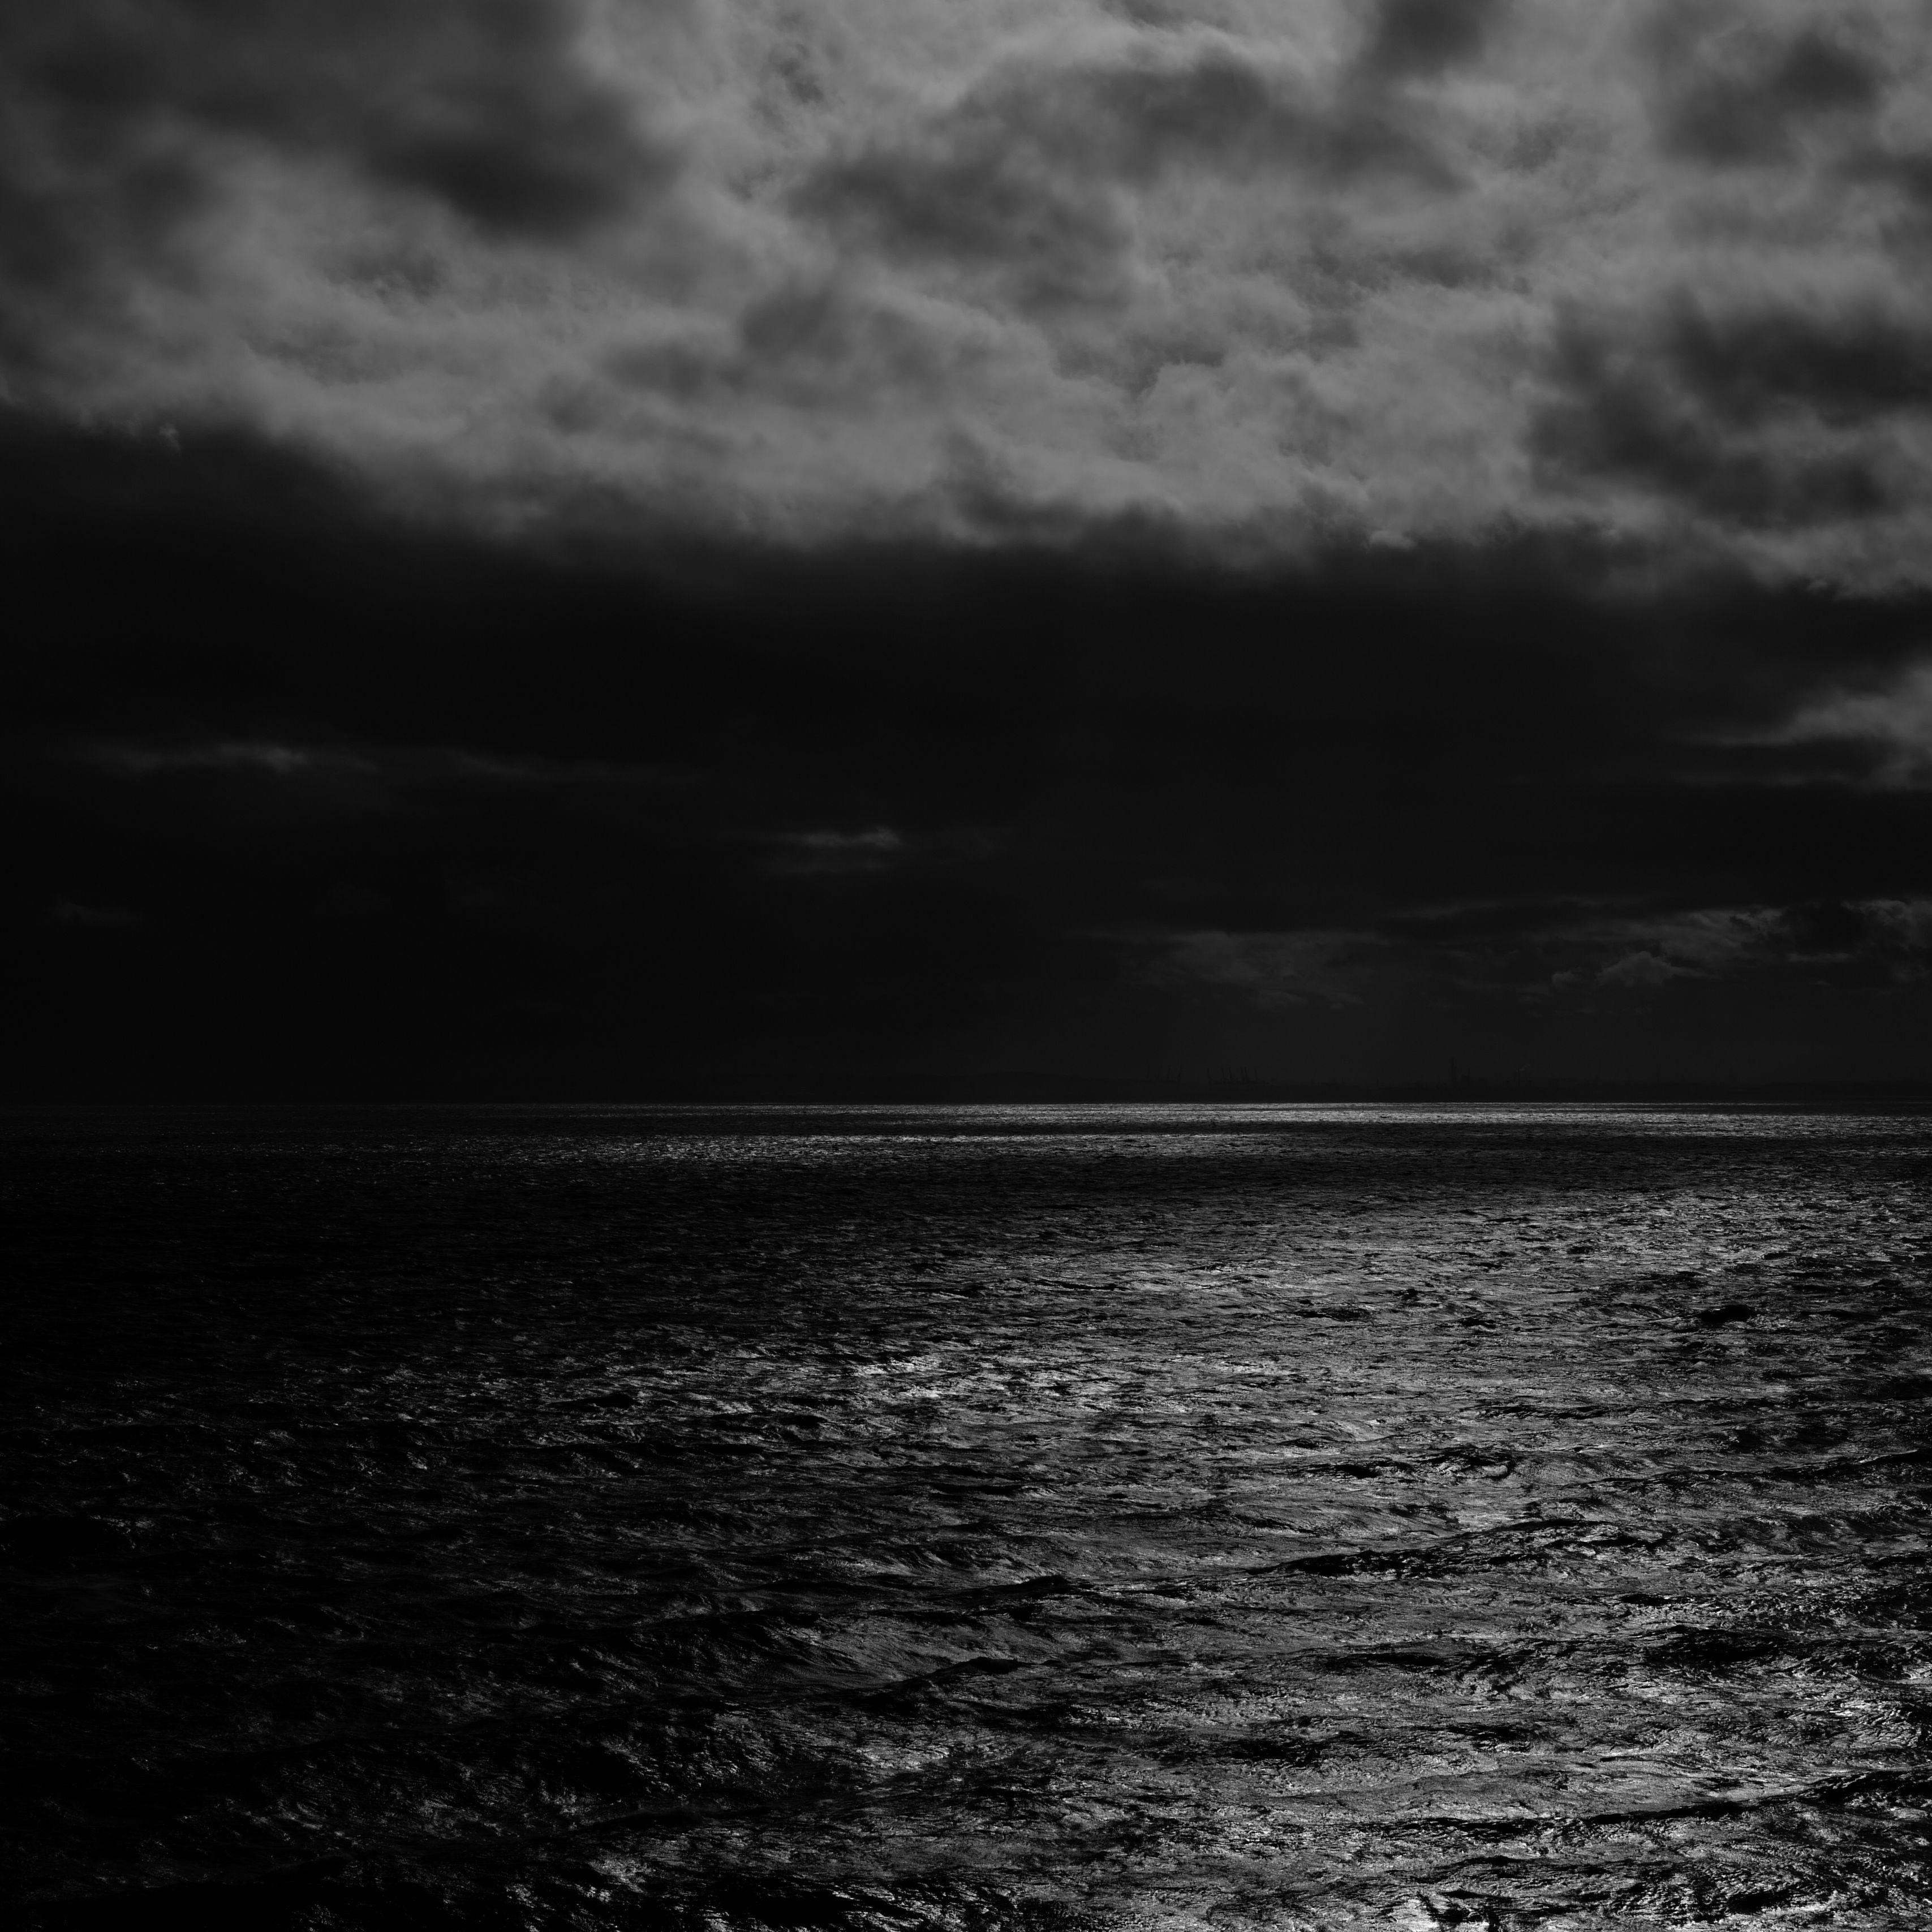 3415x3415 Wallpaper sea, horizon, bw, overcast, clouds, ripples